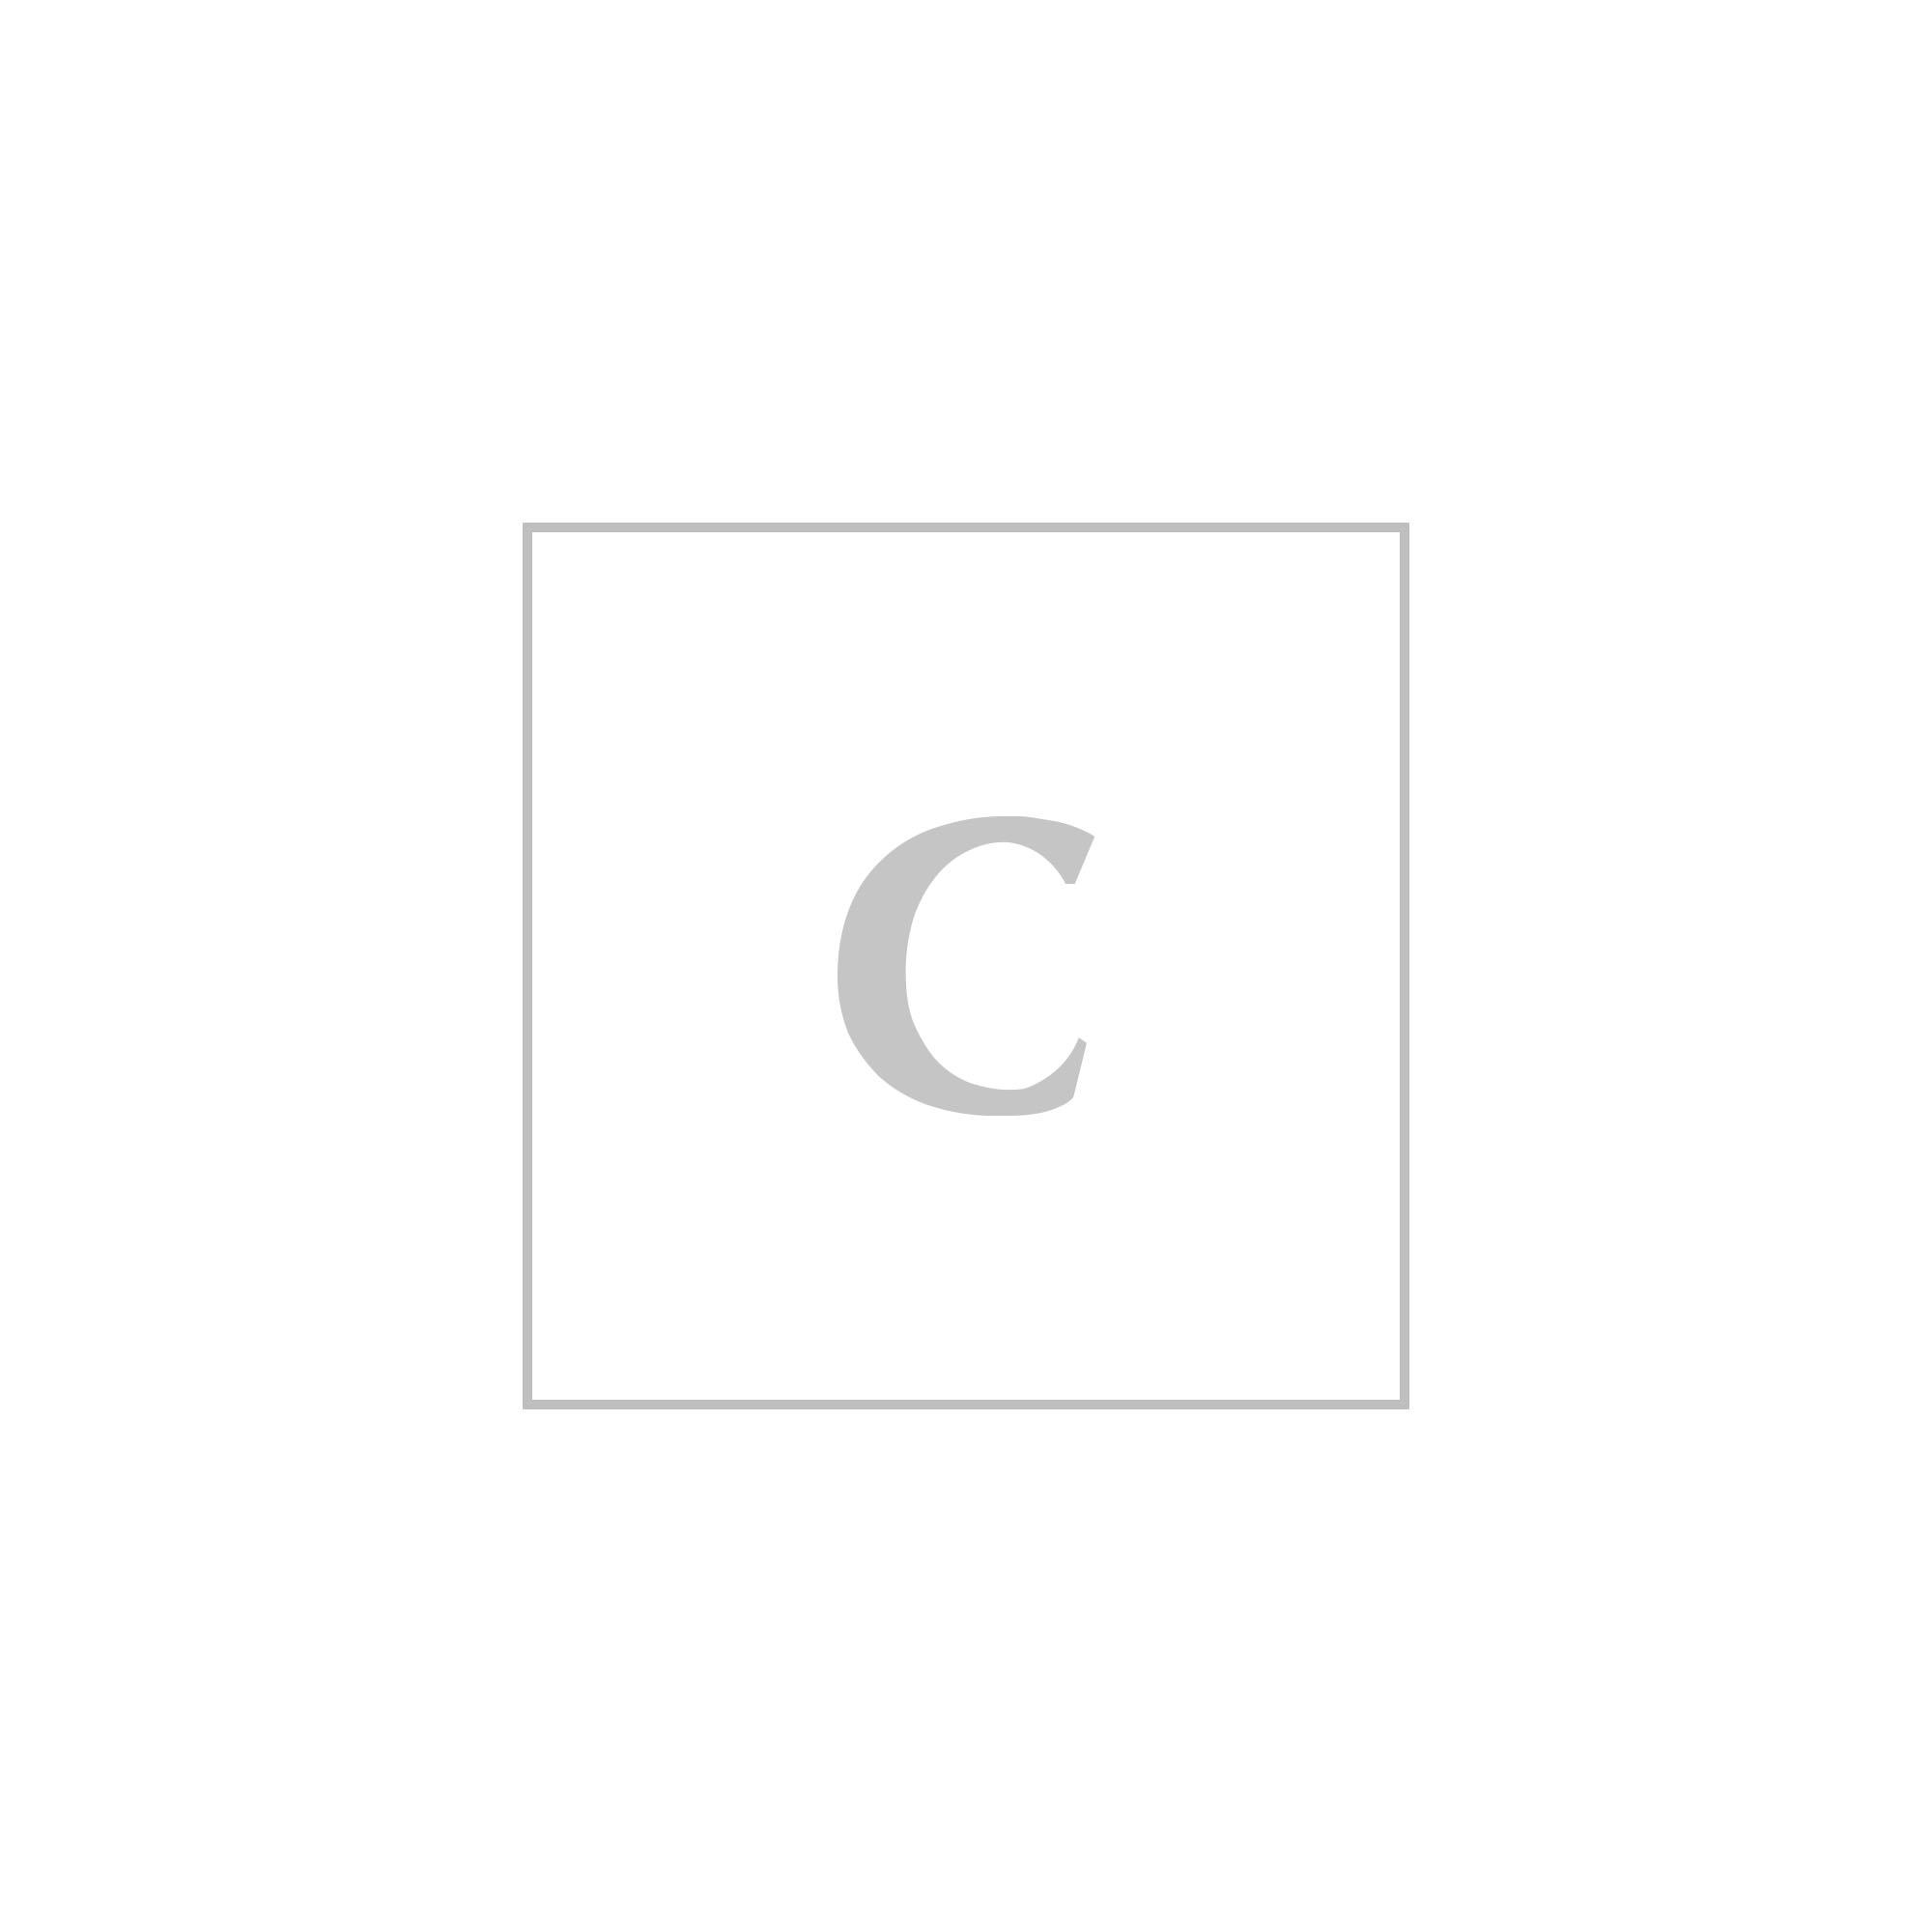 Dolce & gabbana decollete' vernice stampa tessuti